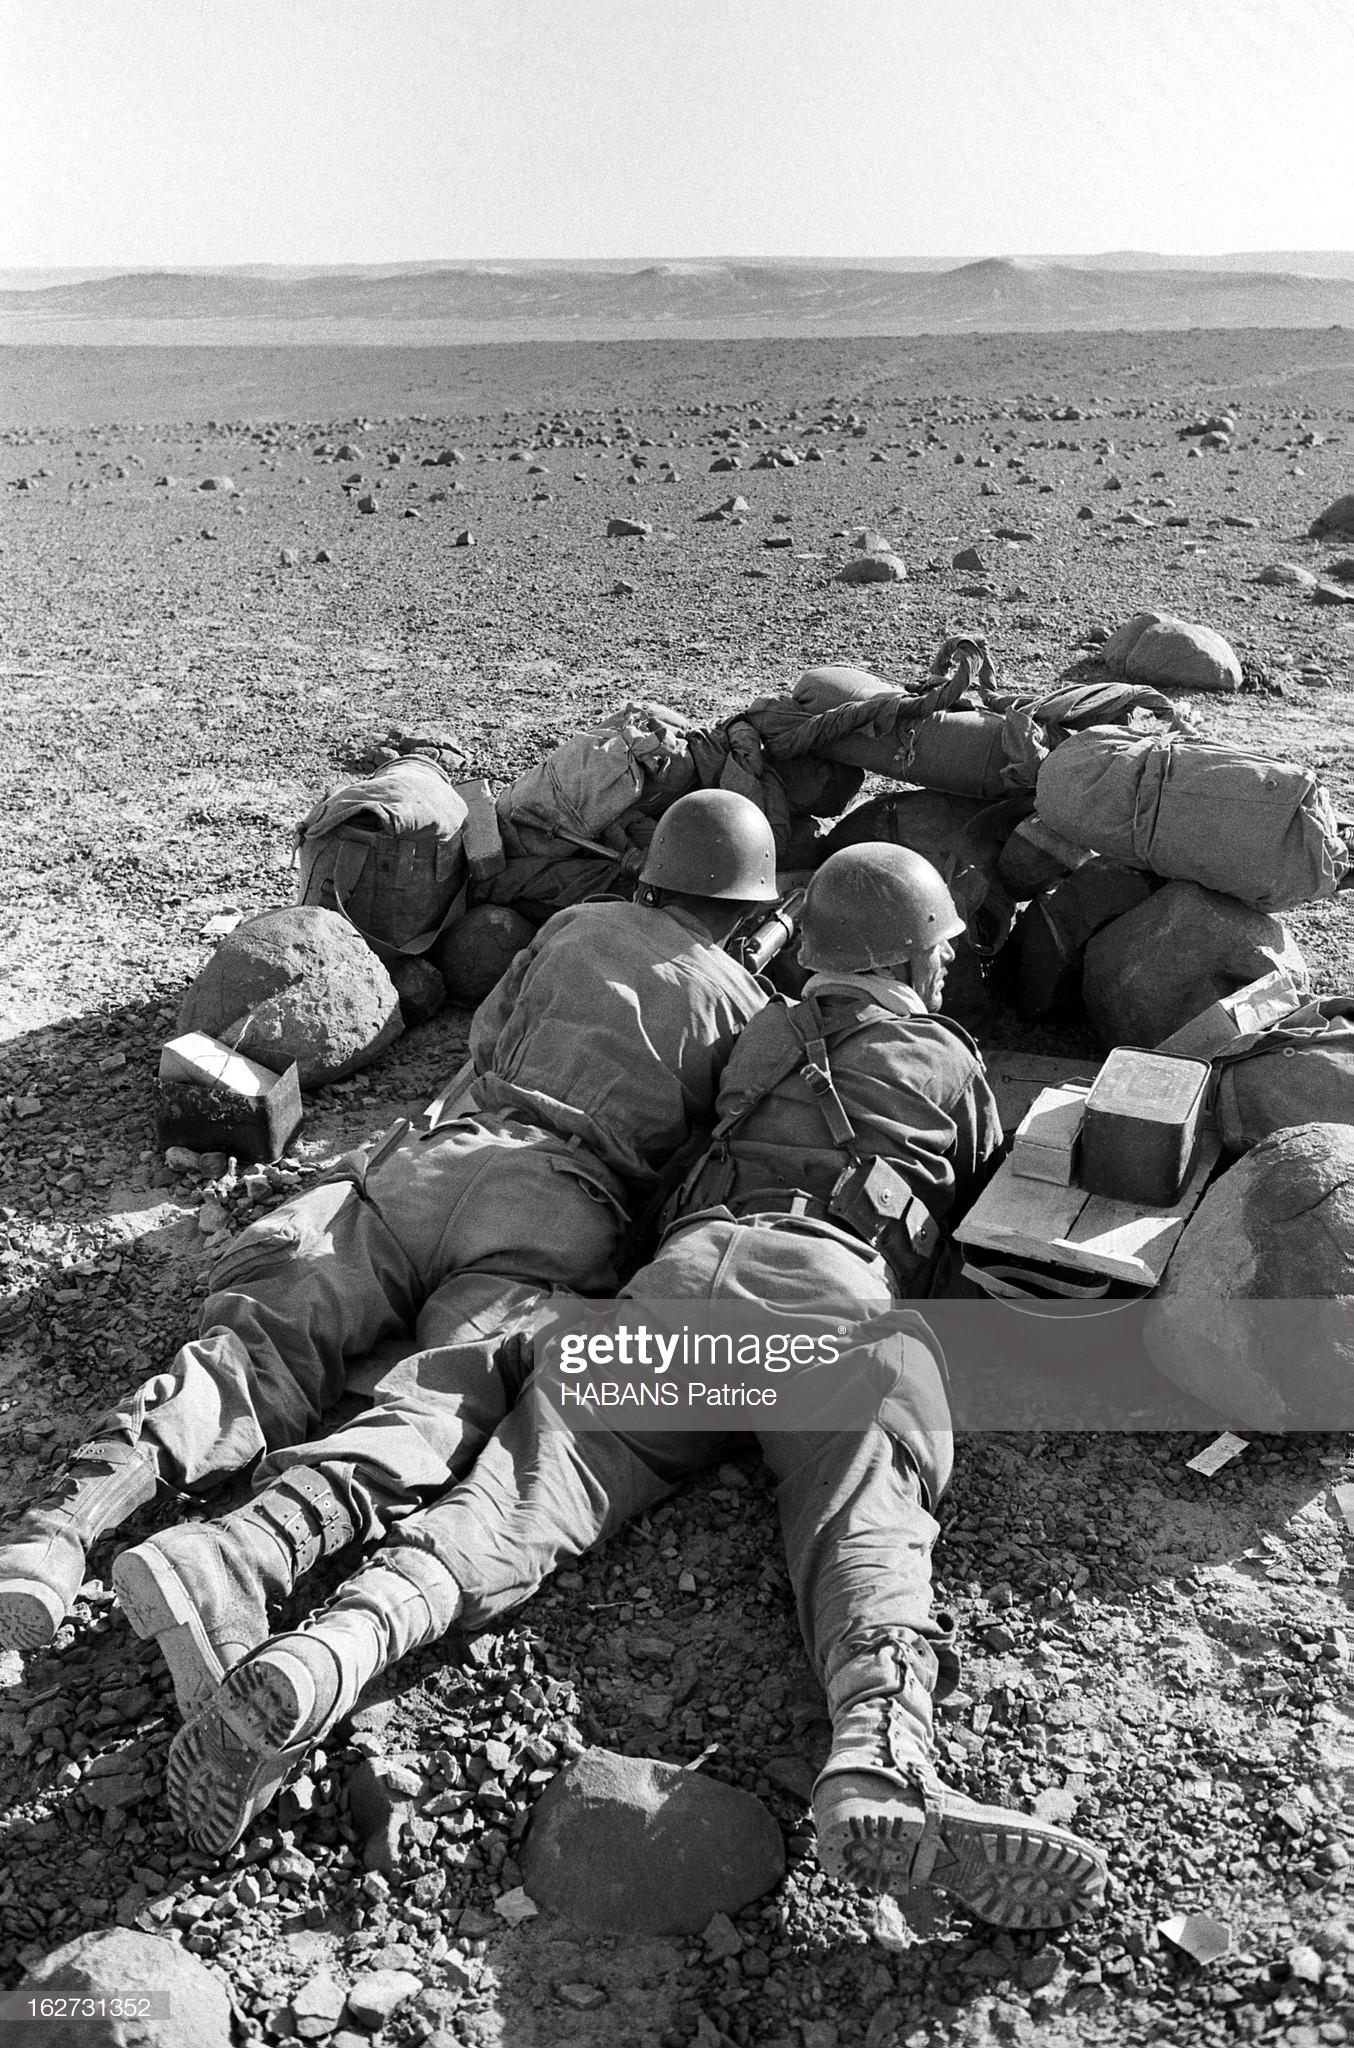 Photos - Guerre des Sables - 1963 - Page 8 47829119962_84f9475cb1_o